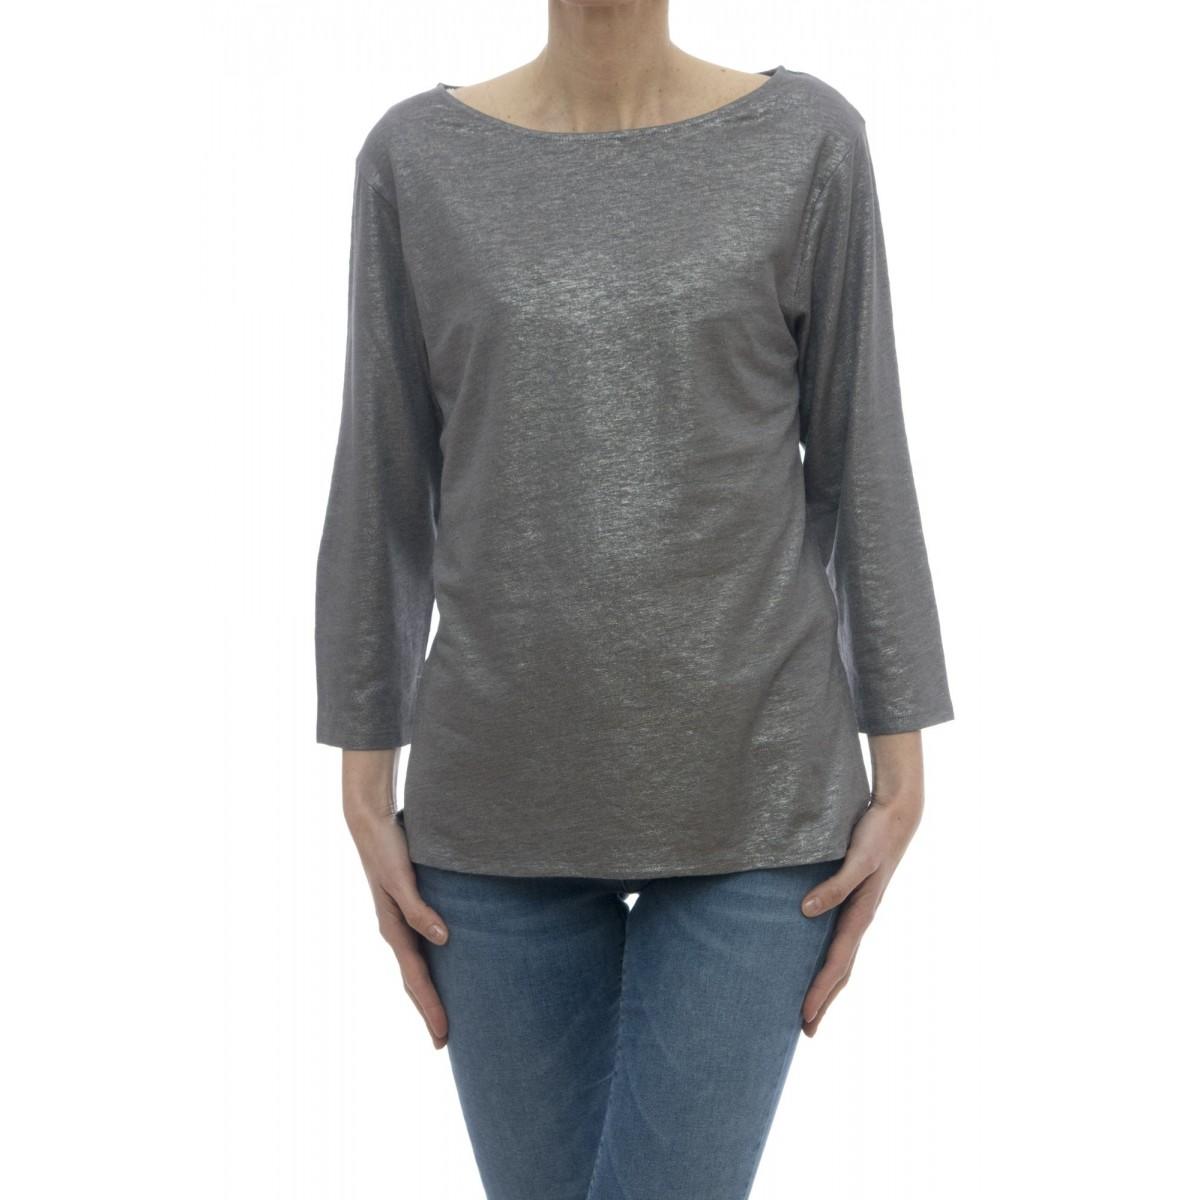 T-shirt - E09 08 lino seta elastane